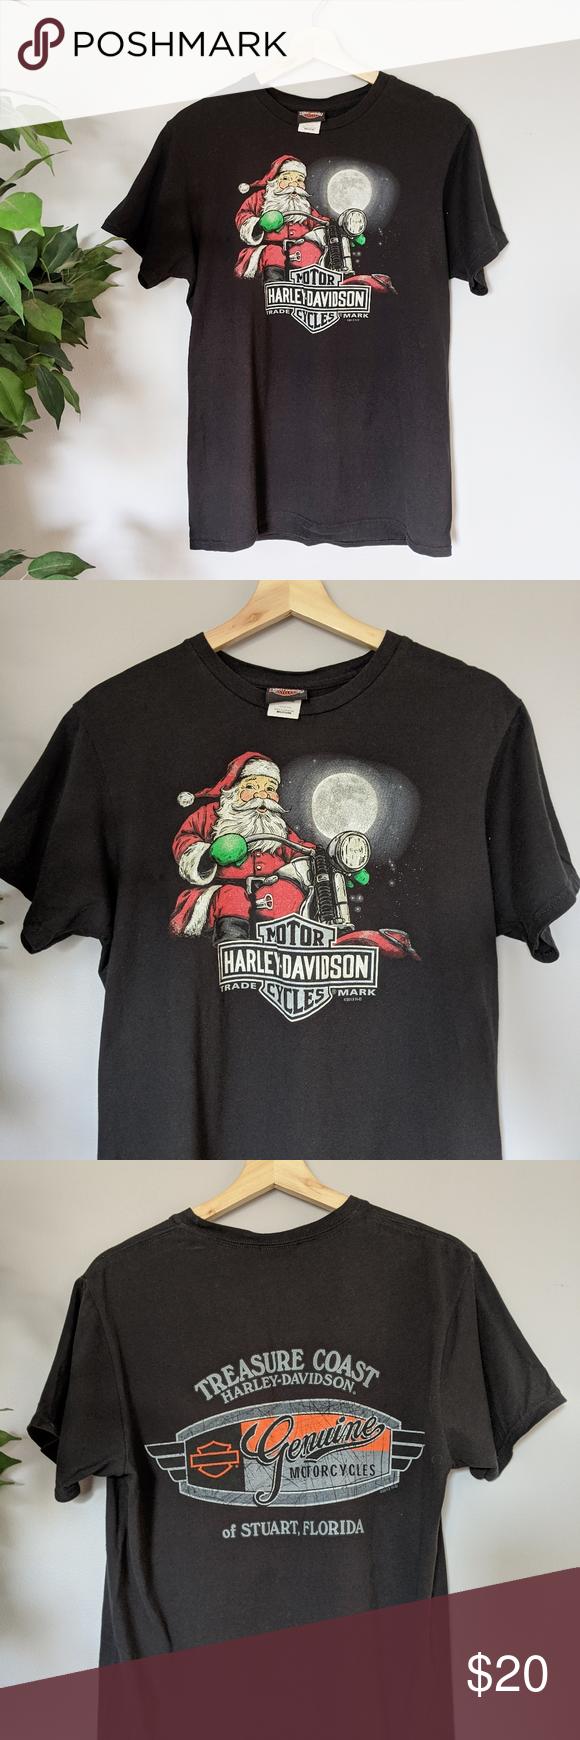 Harley Davidson Christmas tshirt Harley Davidson Christmas tshirt